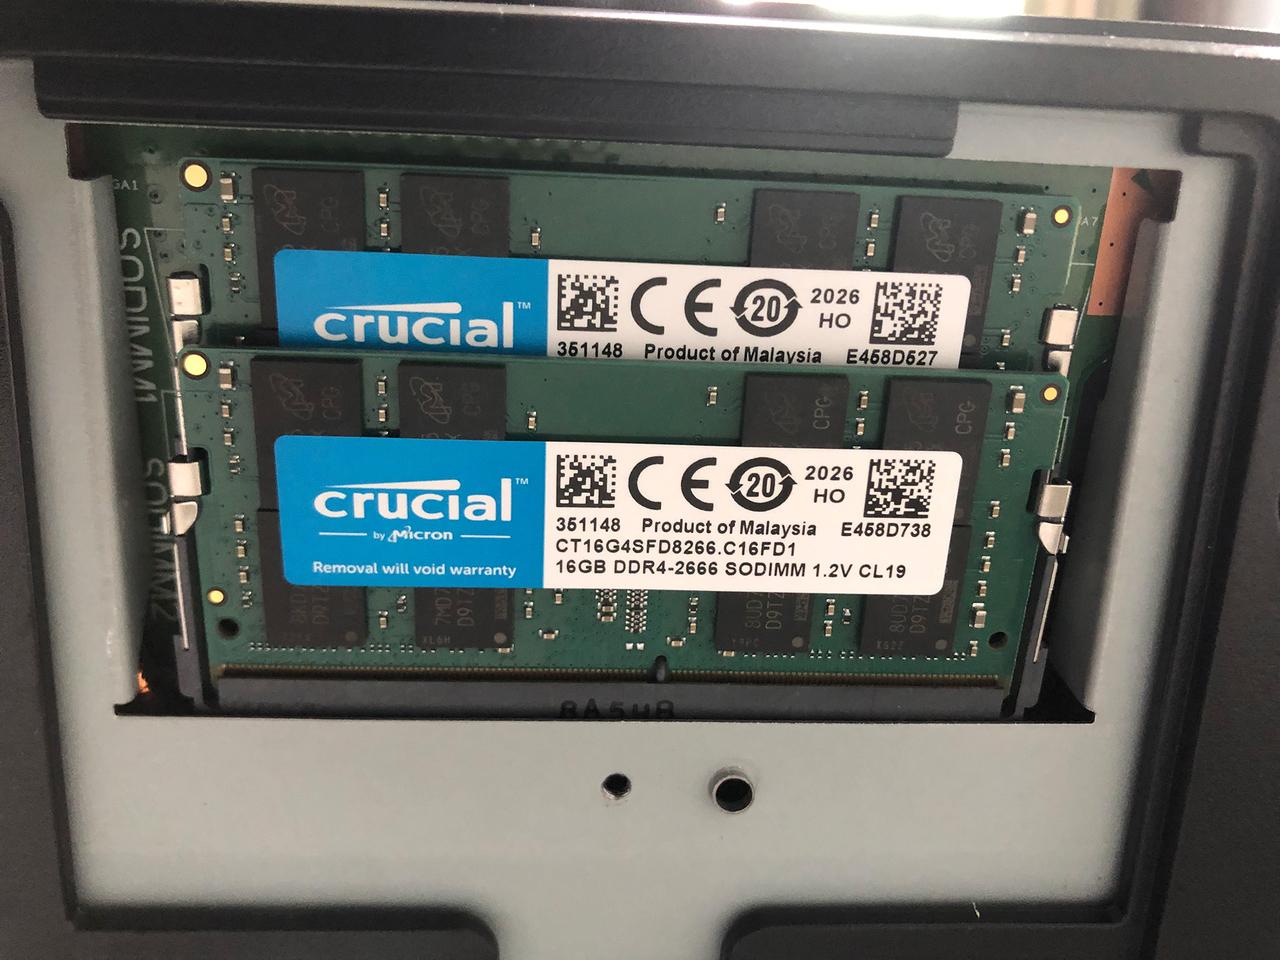 〈ESPRIMO WF2/C3〉に装着したCrucial 32GB Kit (2 x 16GB) DDR4-2666 SODIMM CT2K16G48FD8266